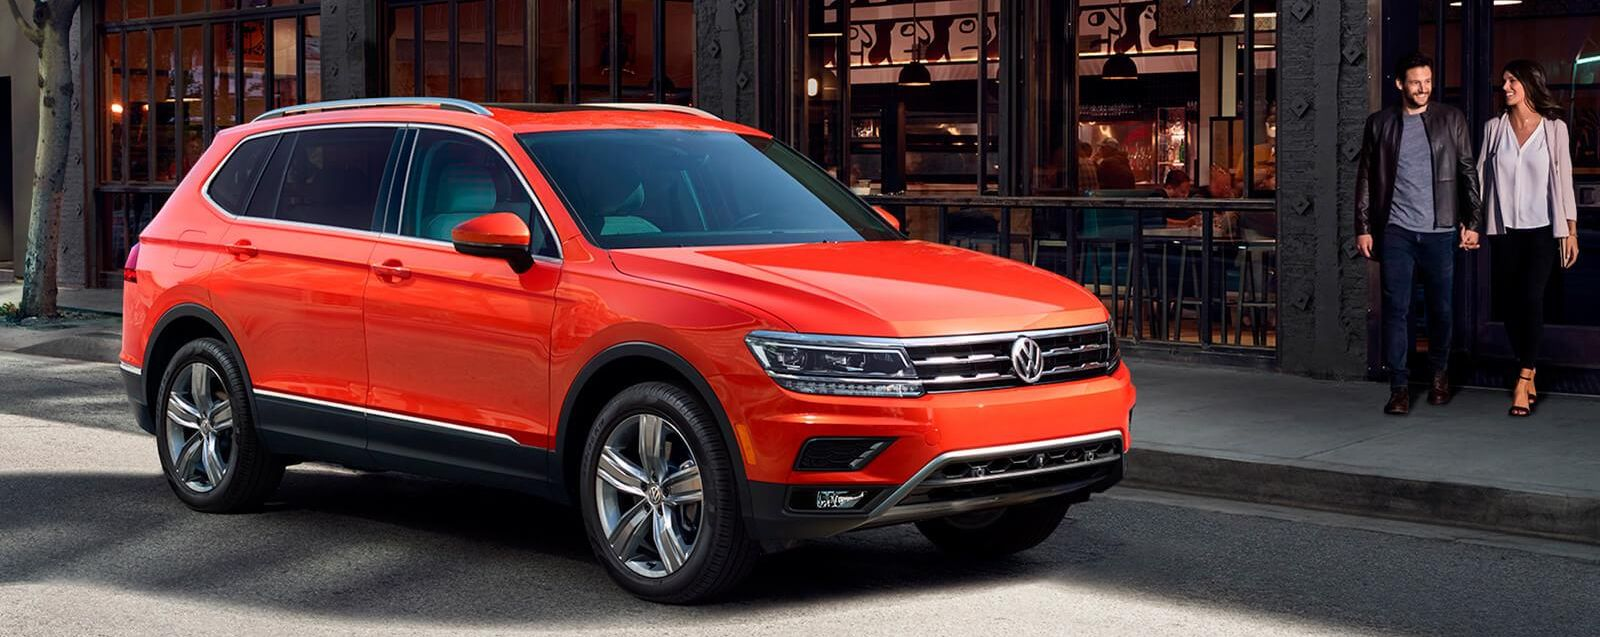 Volkswagen Tiguan 2018 para leasing cerca de Washington, DC